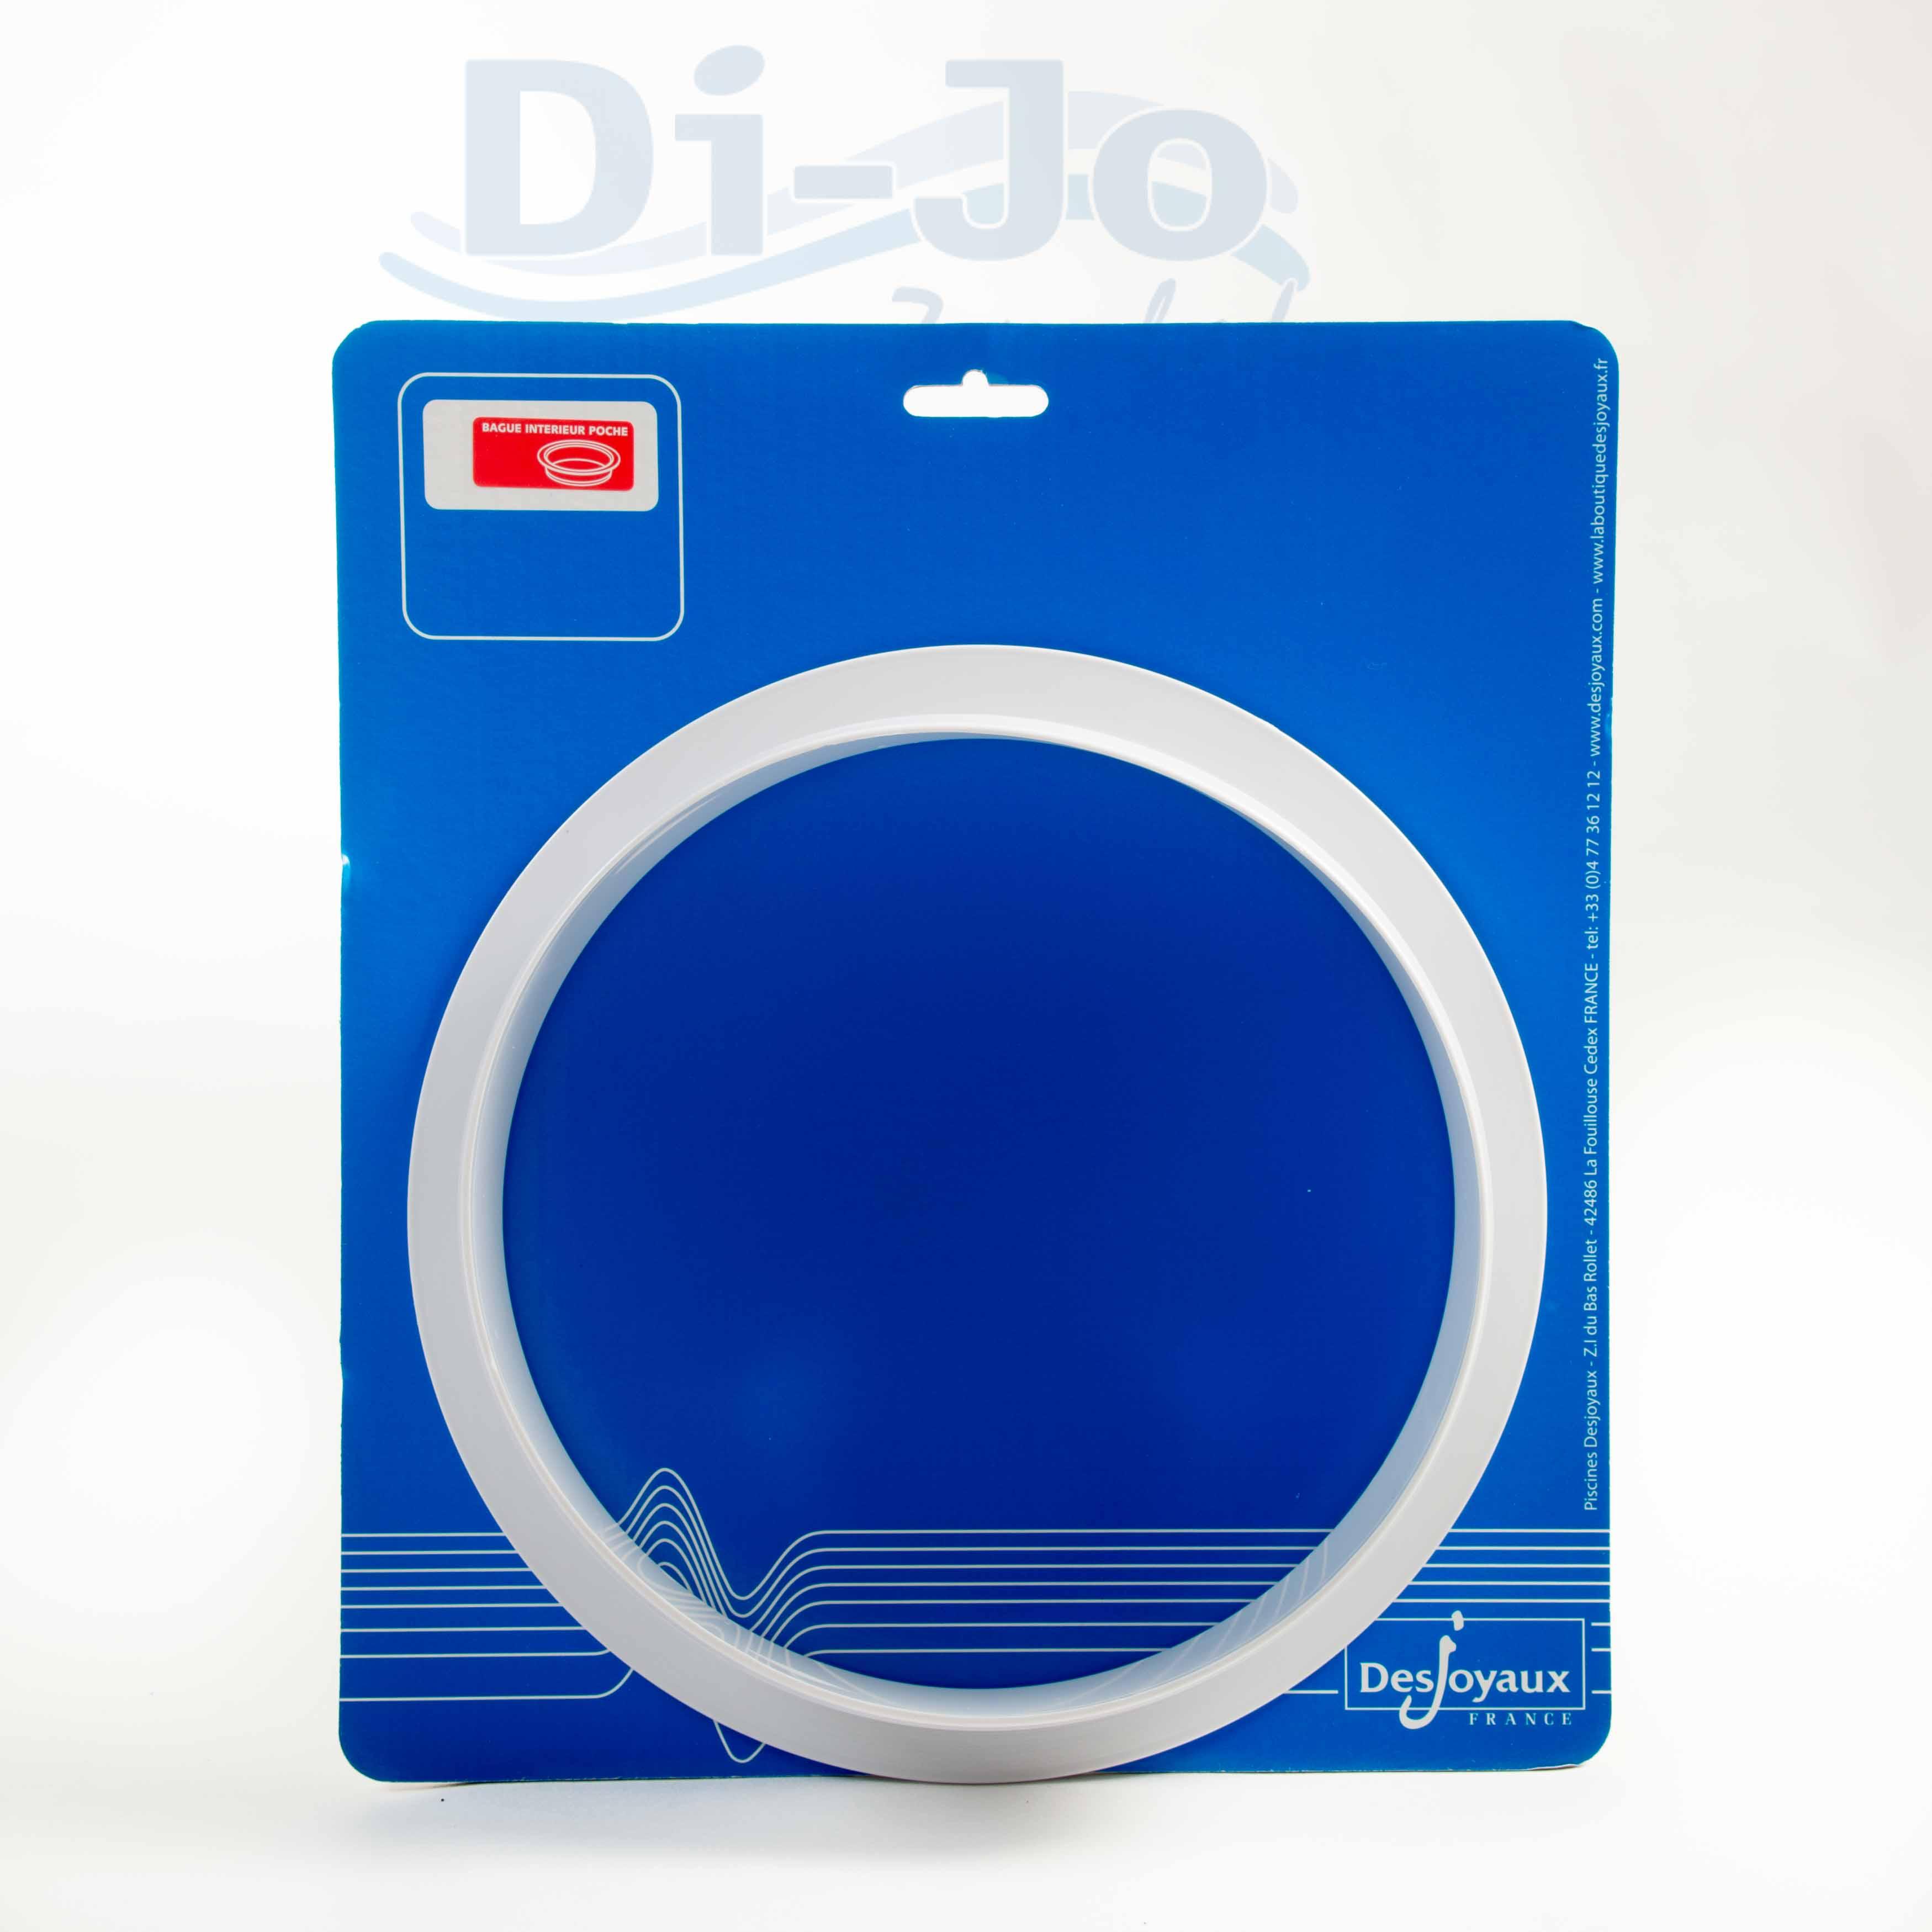 Desjoyaux binnenring voor filterzakken for Exterieur rind